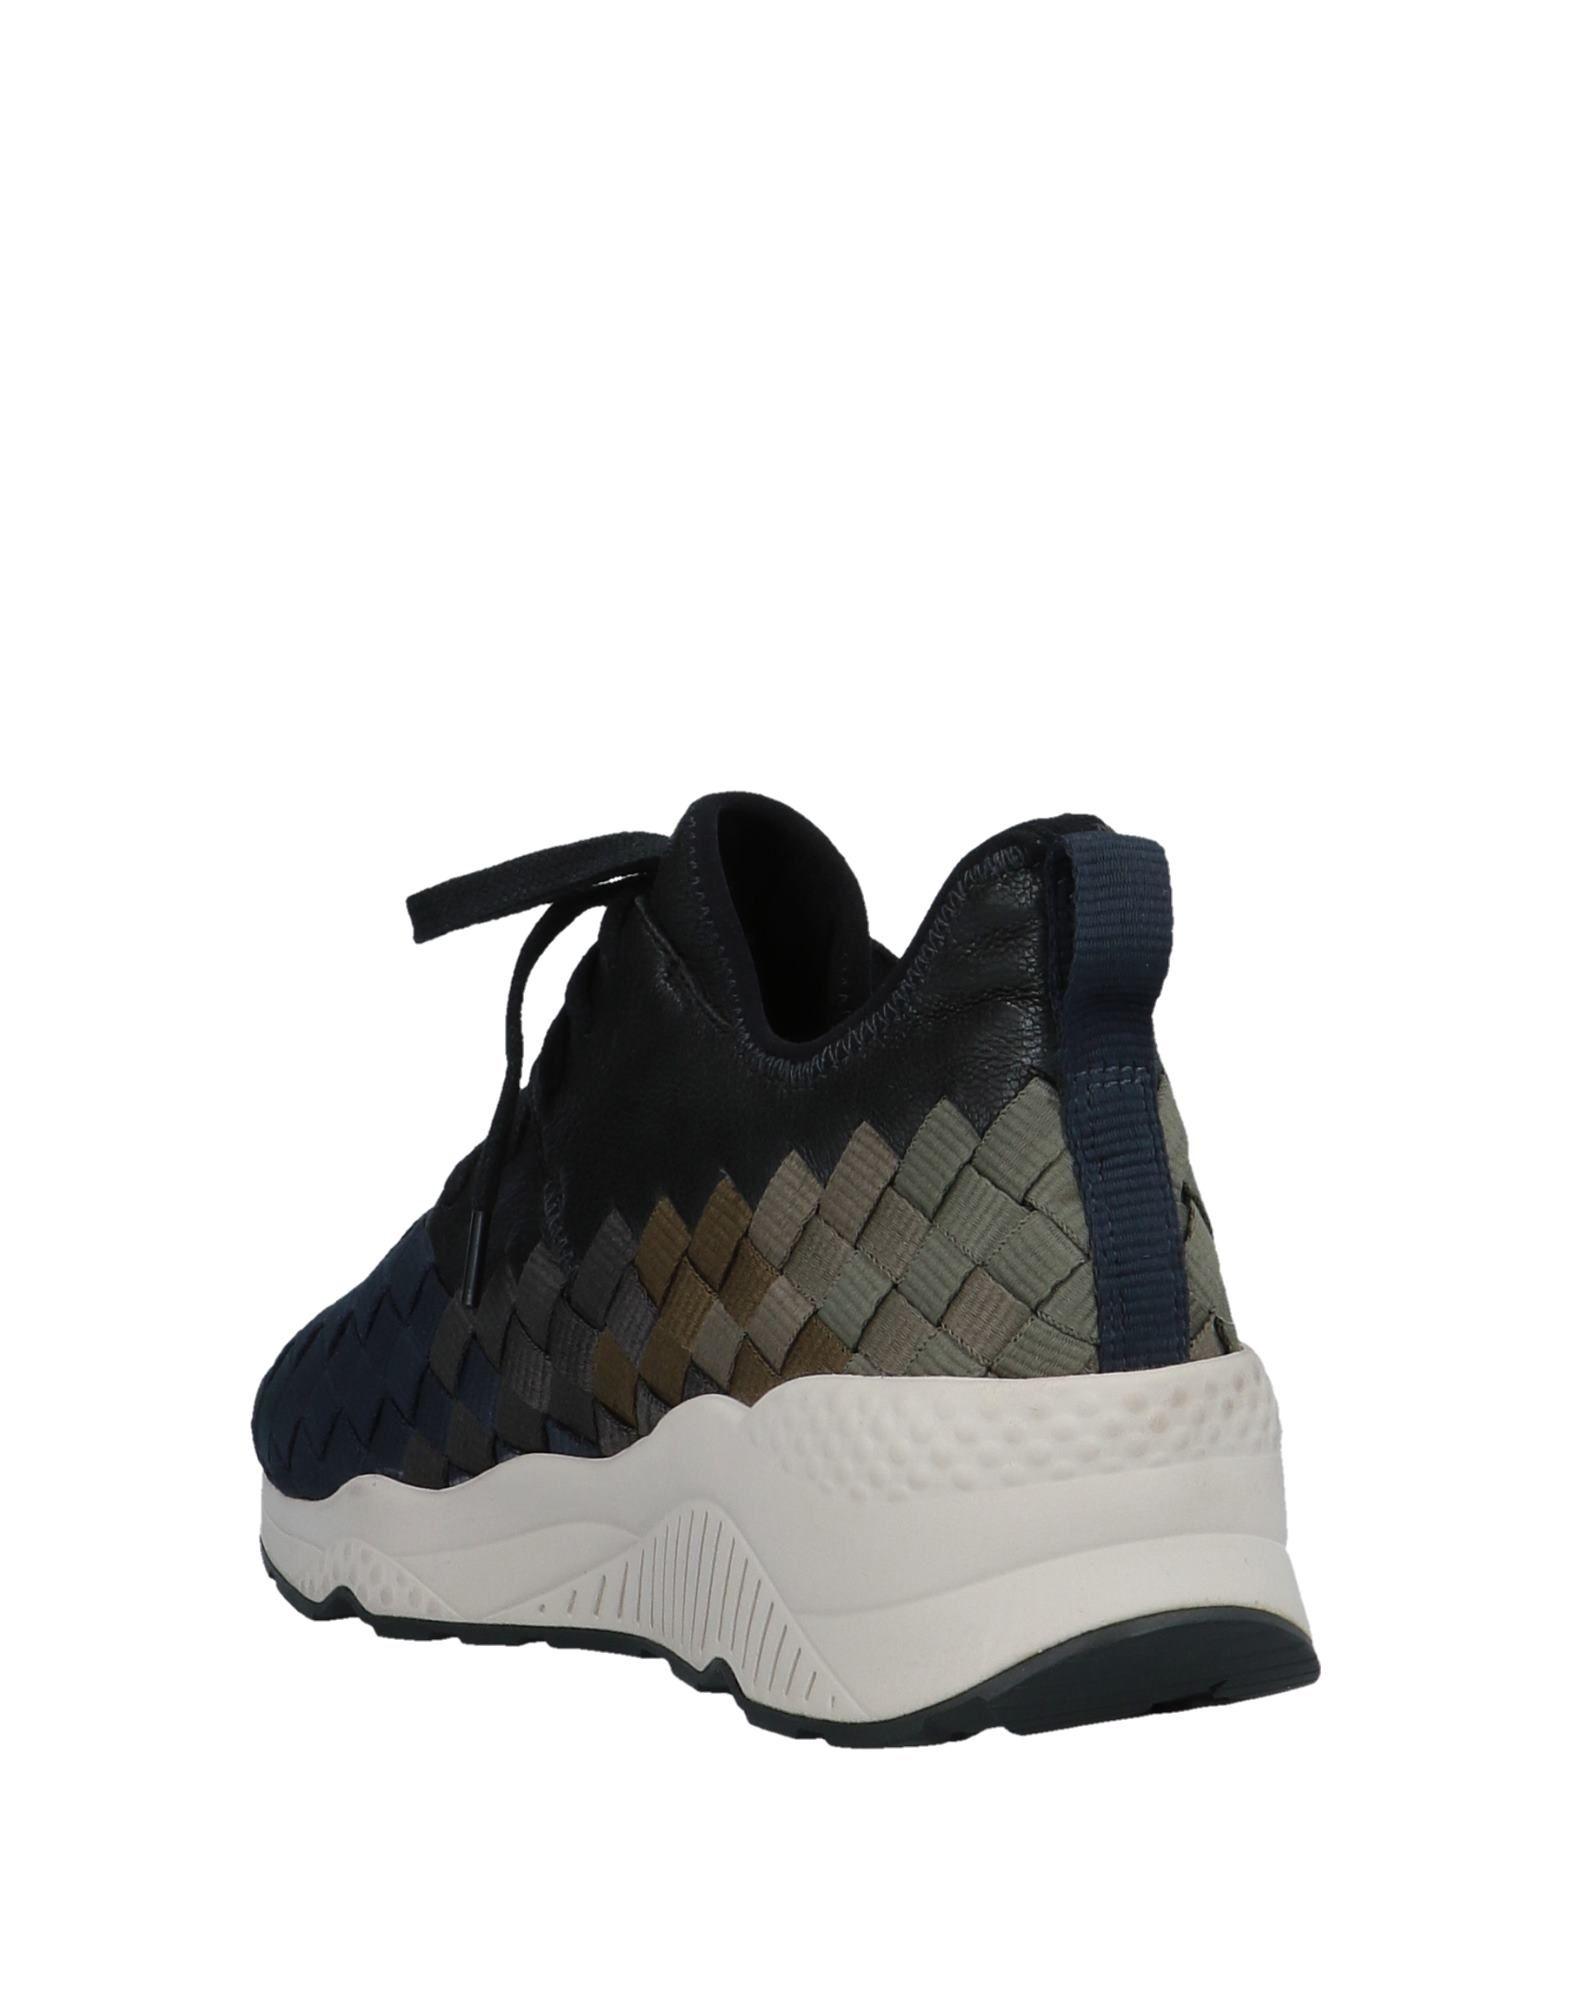 Gut um Sneakers billige Schuhe zu tragenAsh Sneakers um Damen  11557850QS da7c43